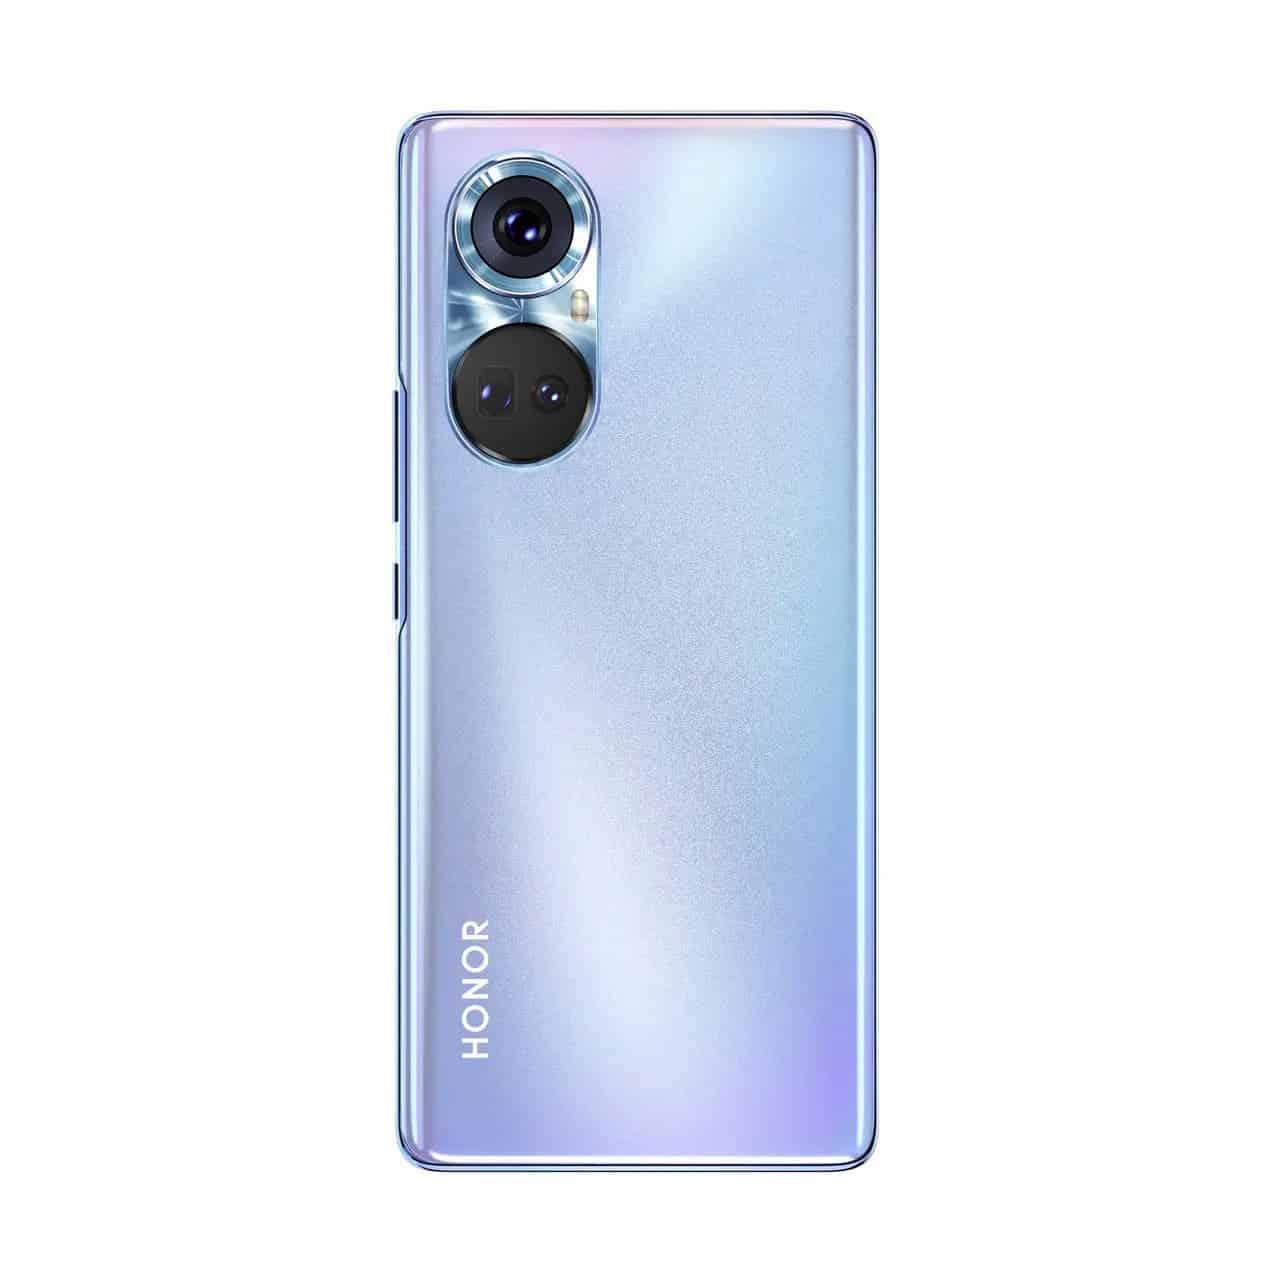 В сеть слили качественный рендер смартфона Honor 50 (aad85763a3ed4e9f91db796e754e4020)